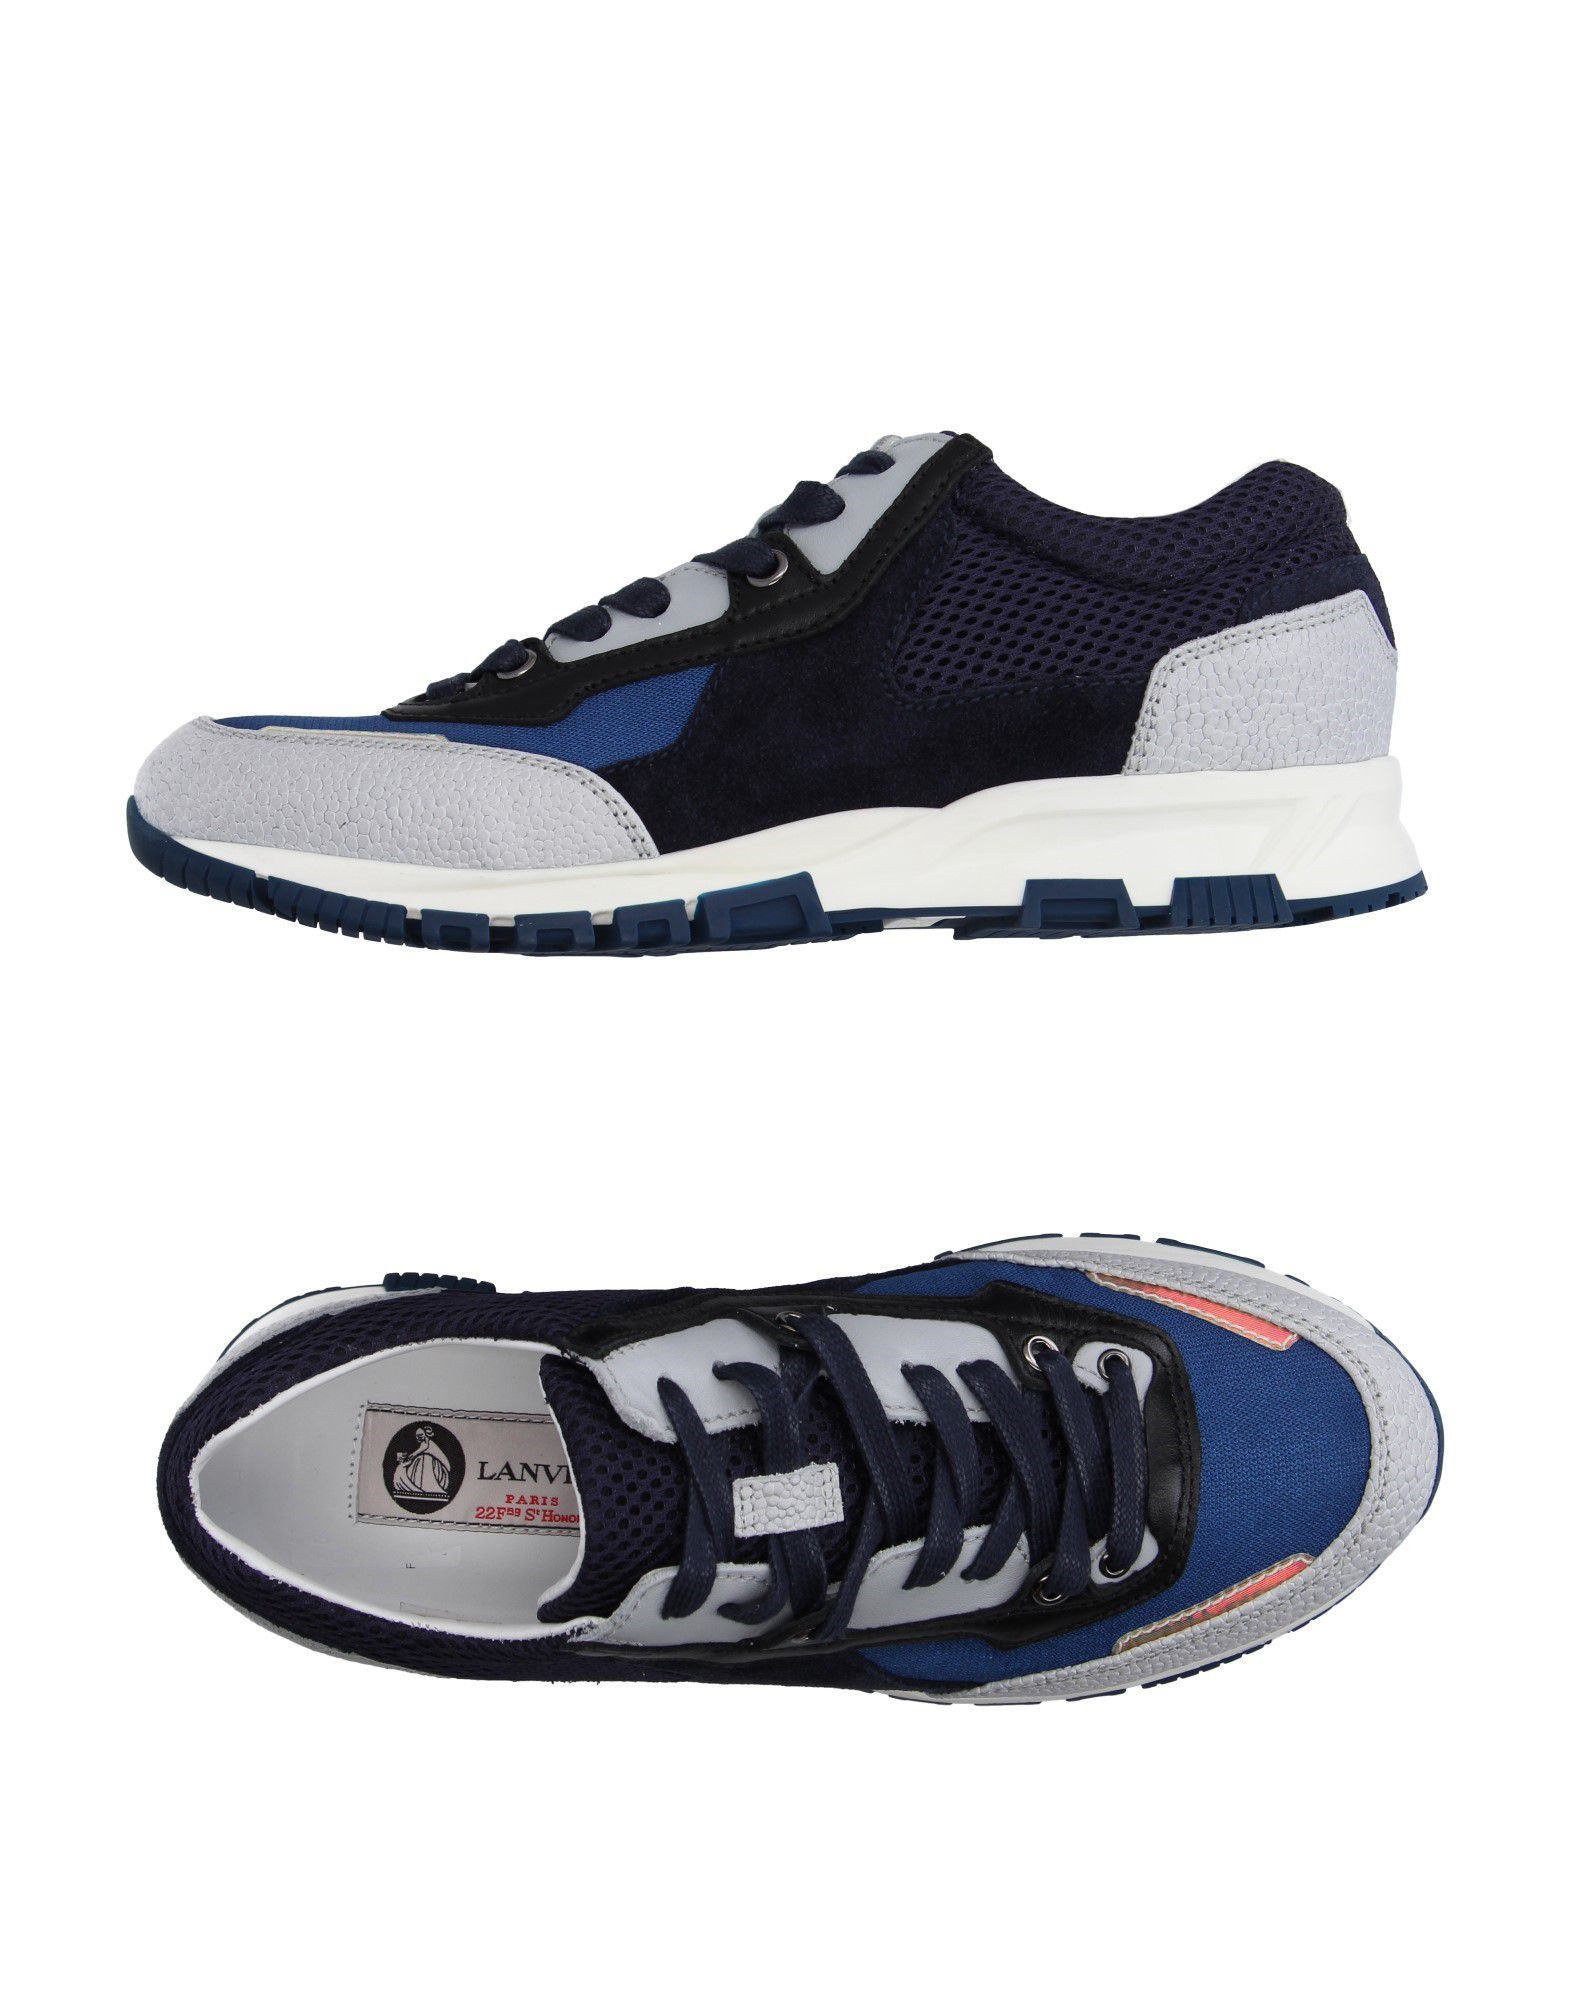 Lanvin Damen Sneakers Damen Lanvin  11155571RA Heiße Schuhe 104eee